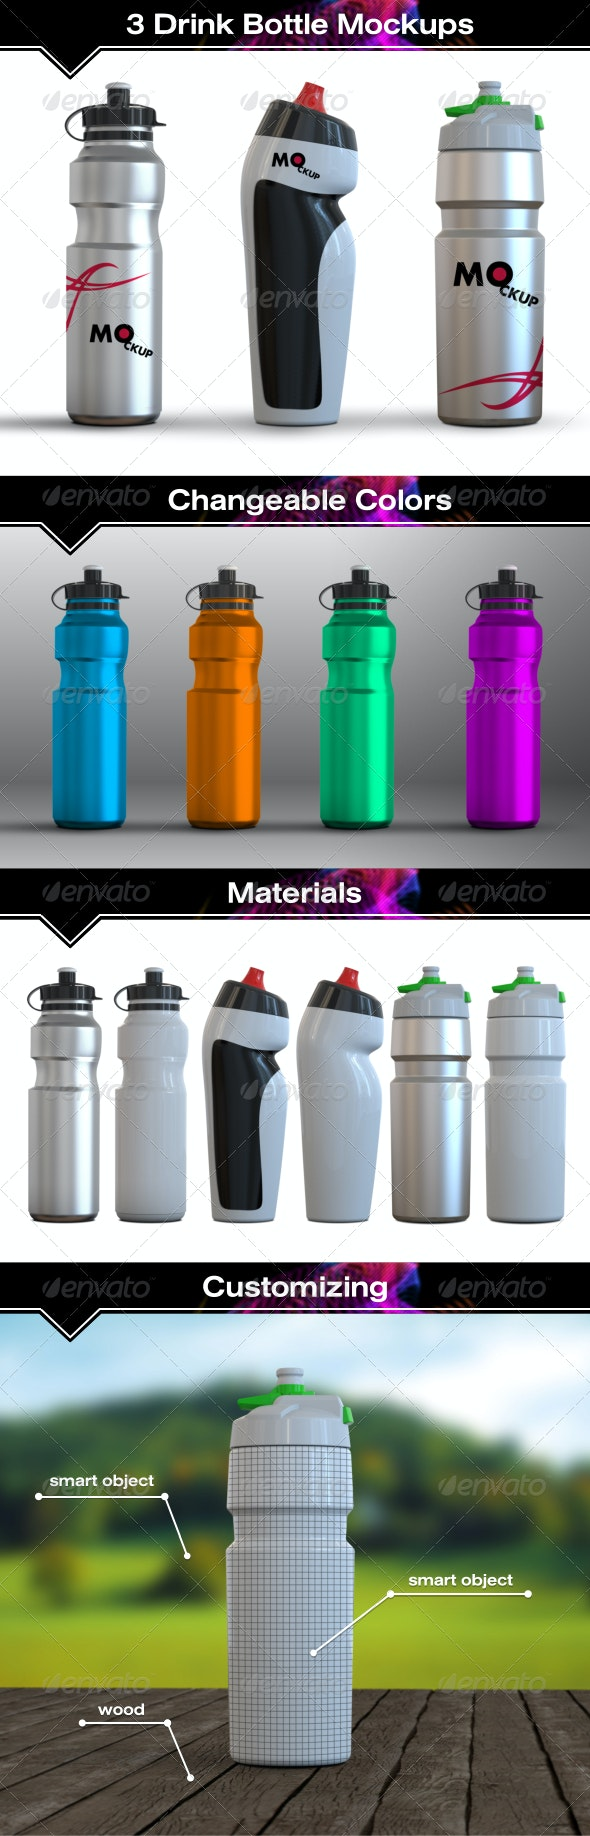 3 Drink Water Bottle Mockups - Food and Drink Packaging